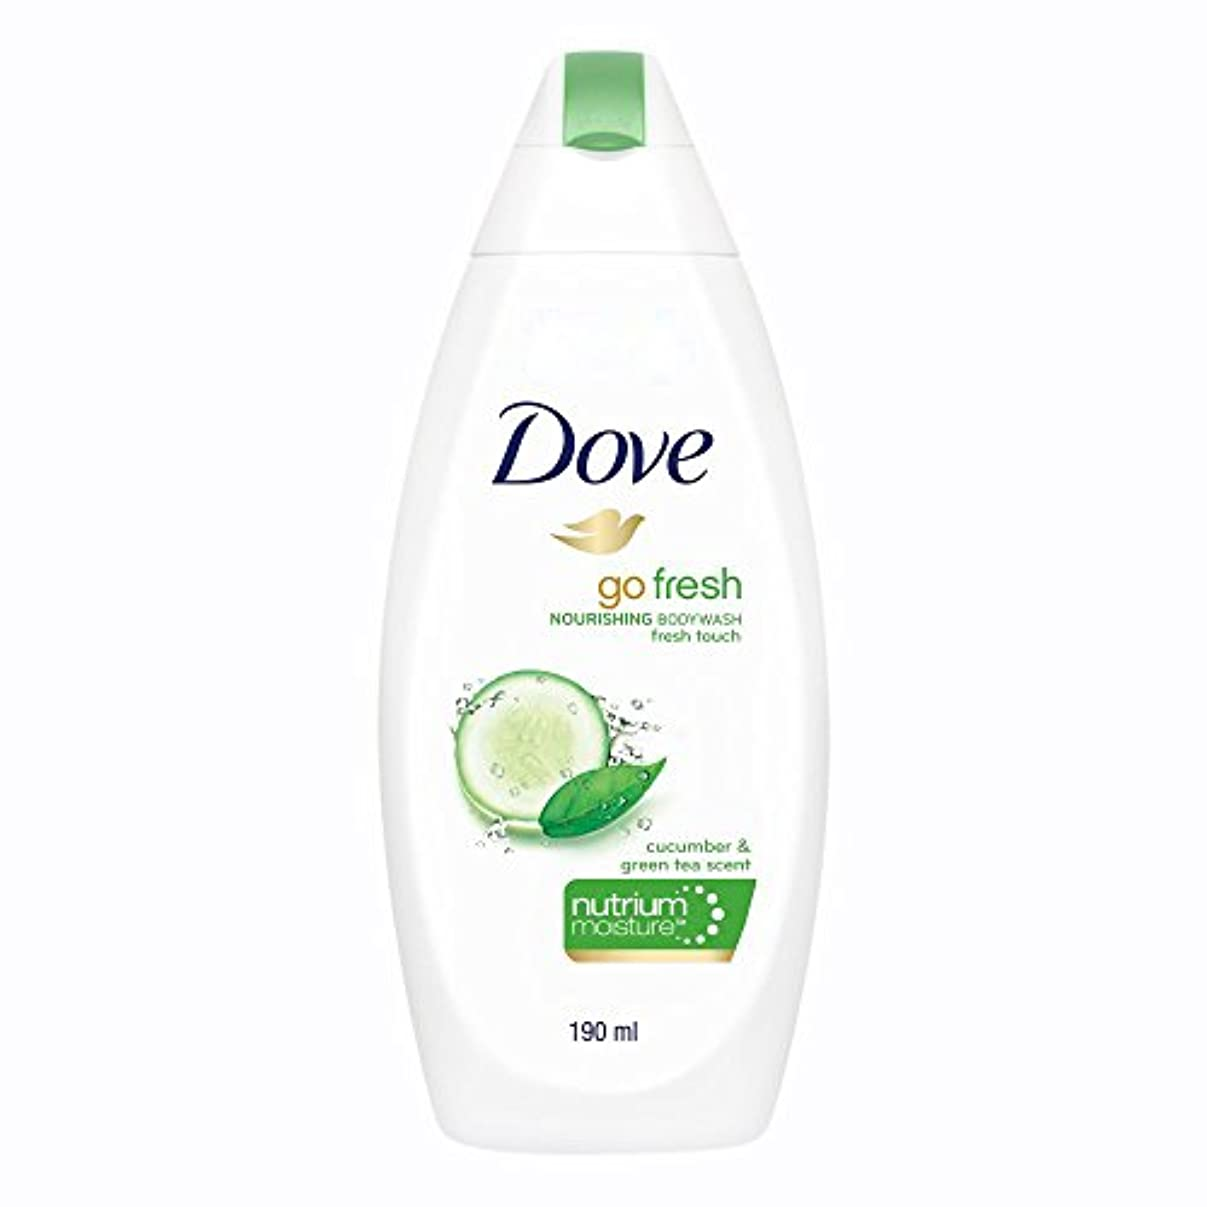 Dove Go Fresh Nourishing Refreshing Cucumber And Green Tea Body Wash, 190ml